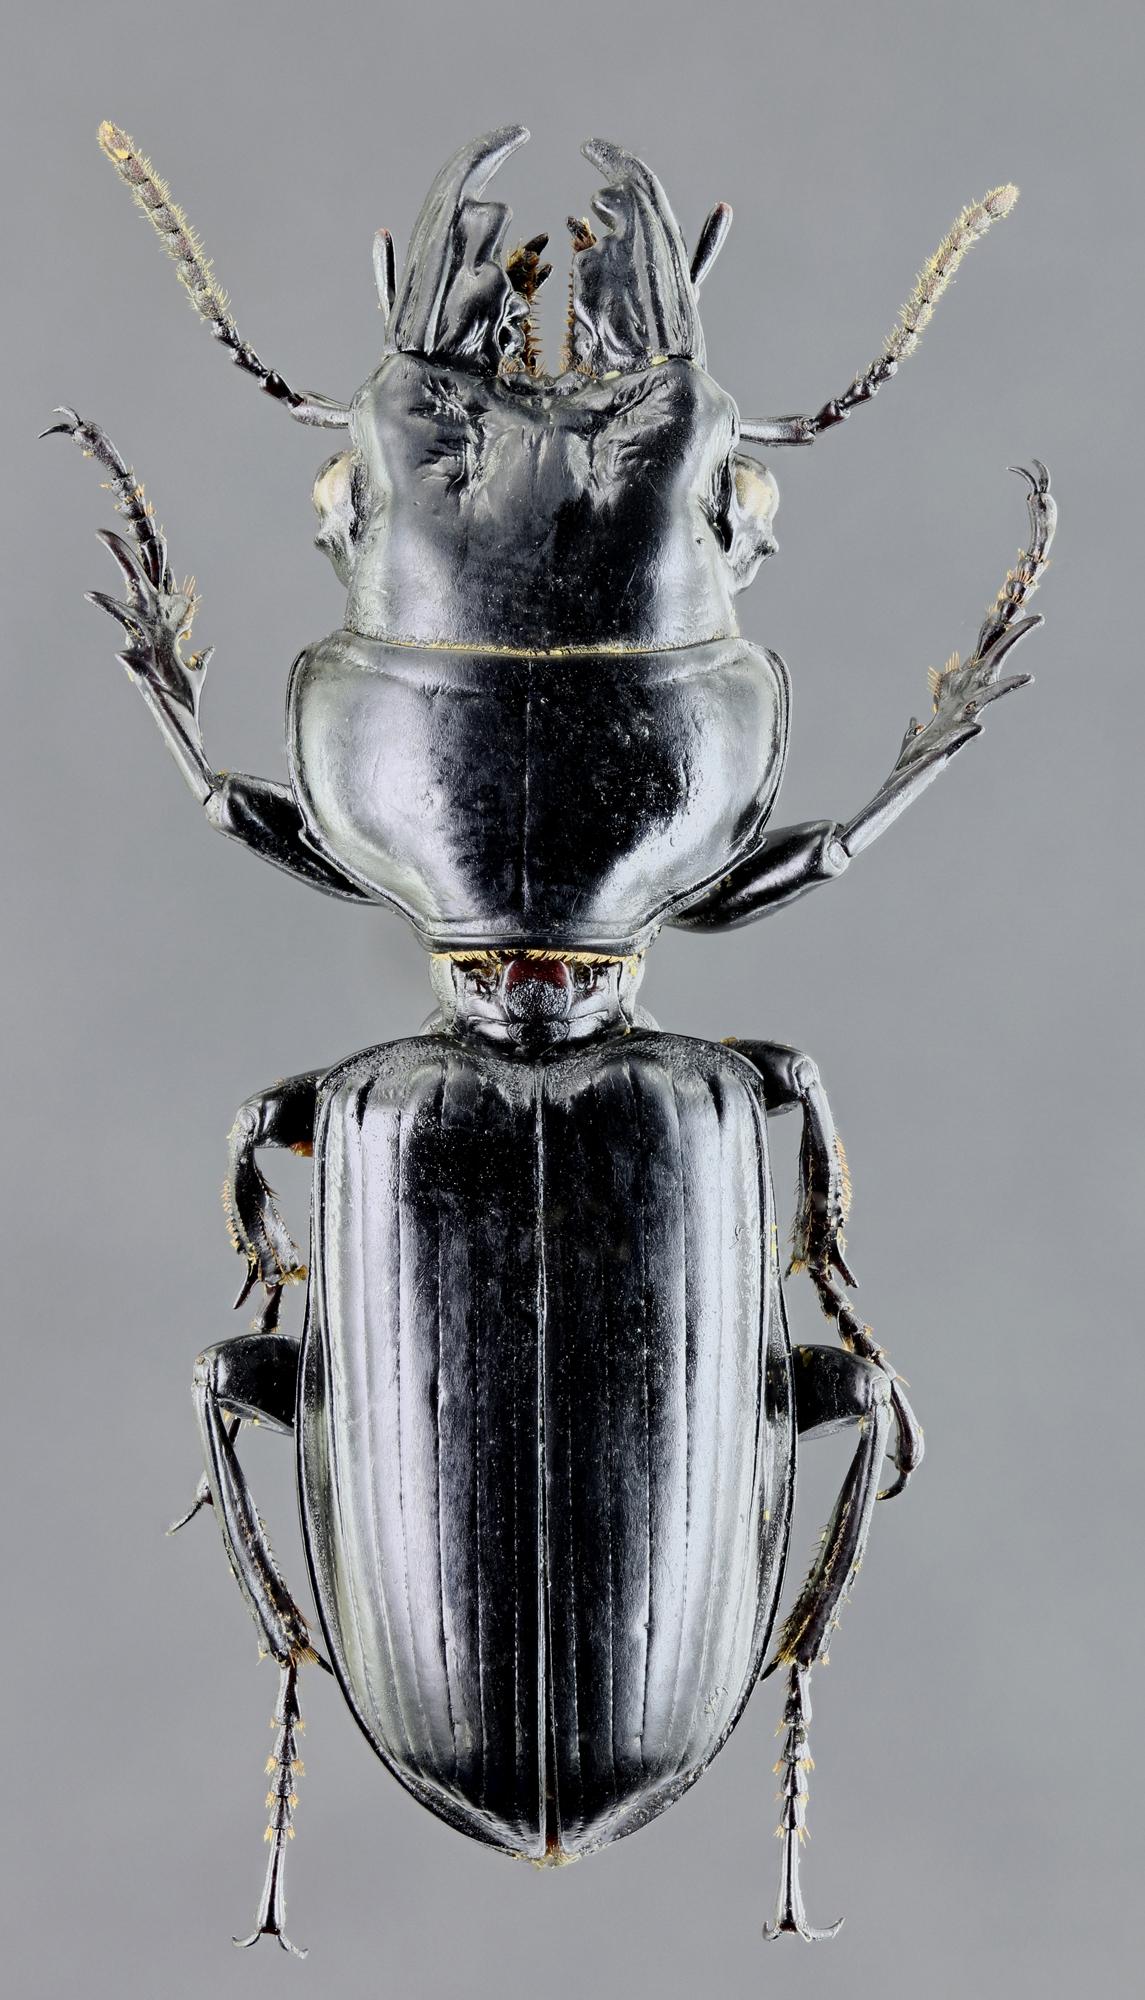 Neochryopus savagei 45400zs10.jpg